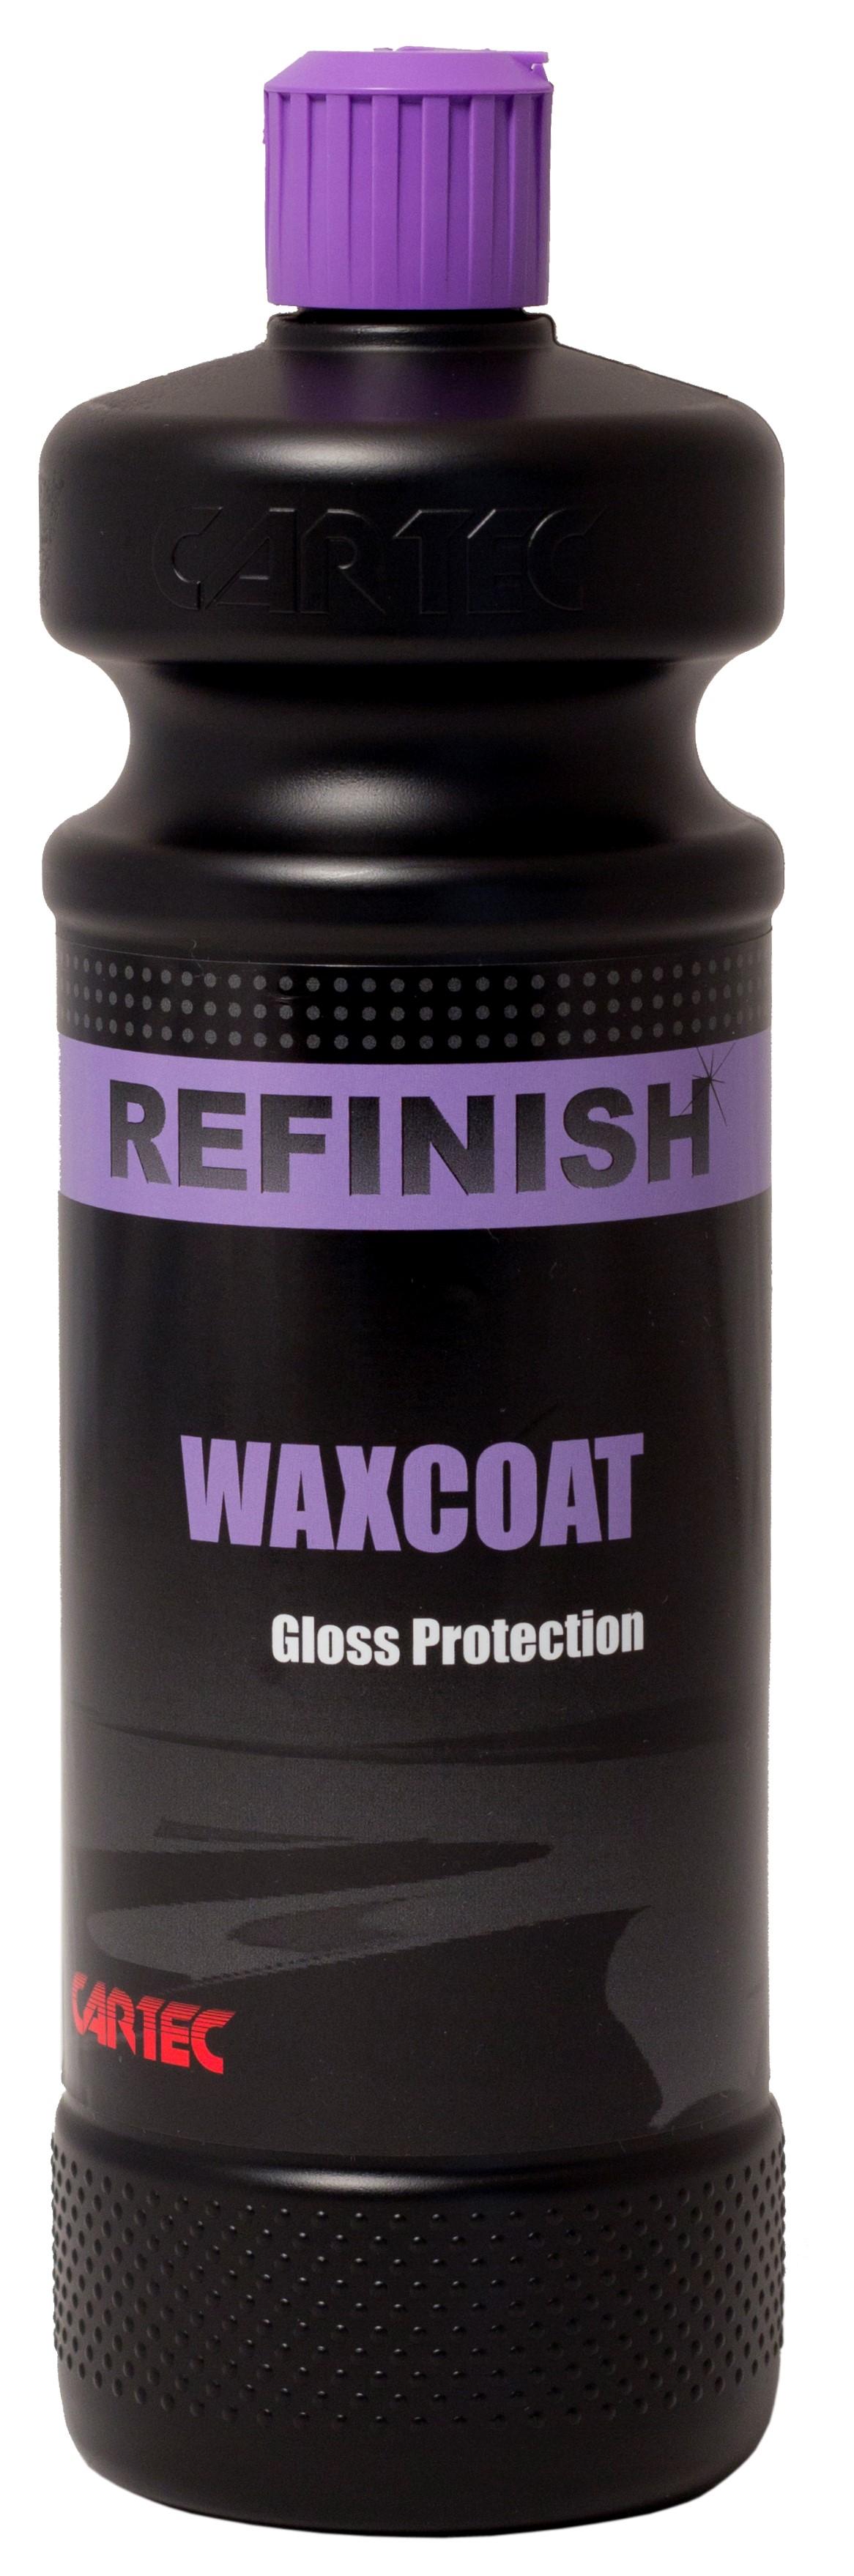 Cartec WaxCoat 1lt